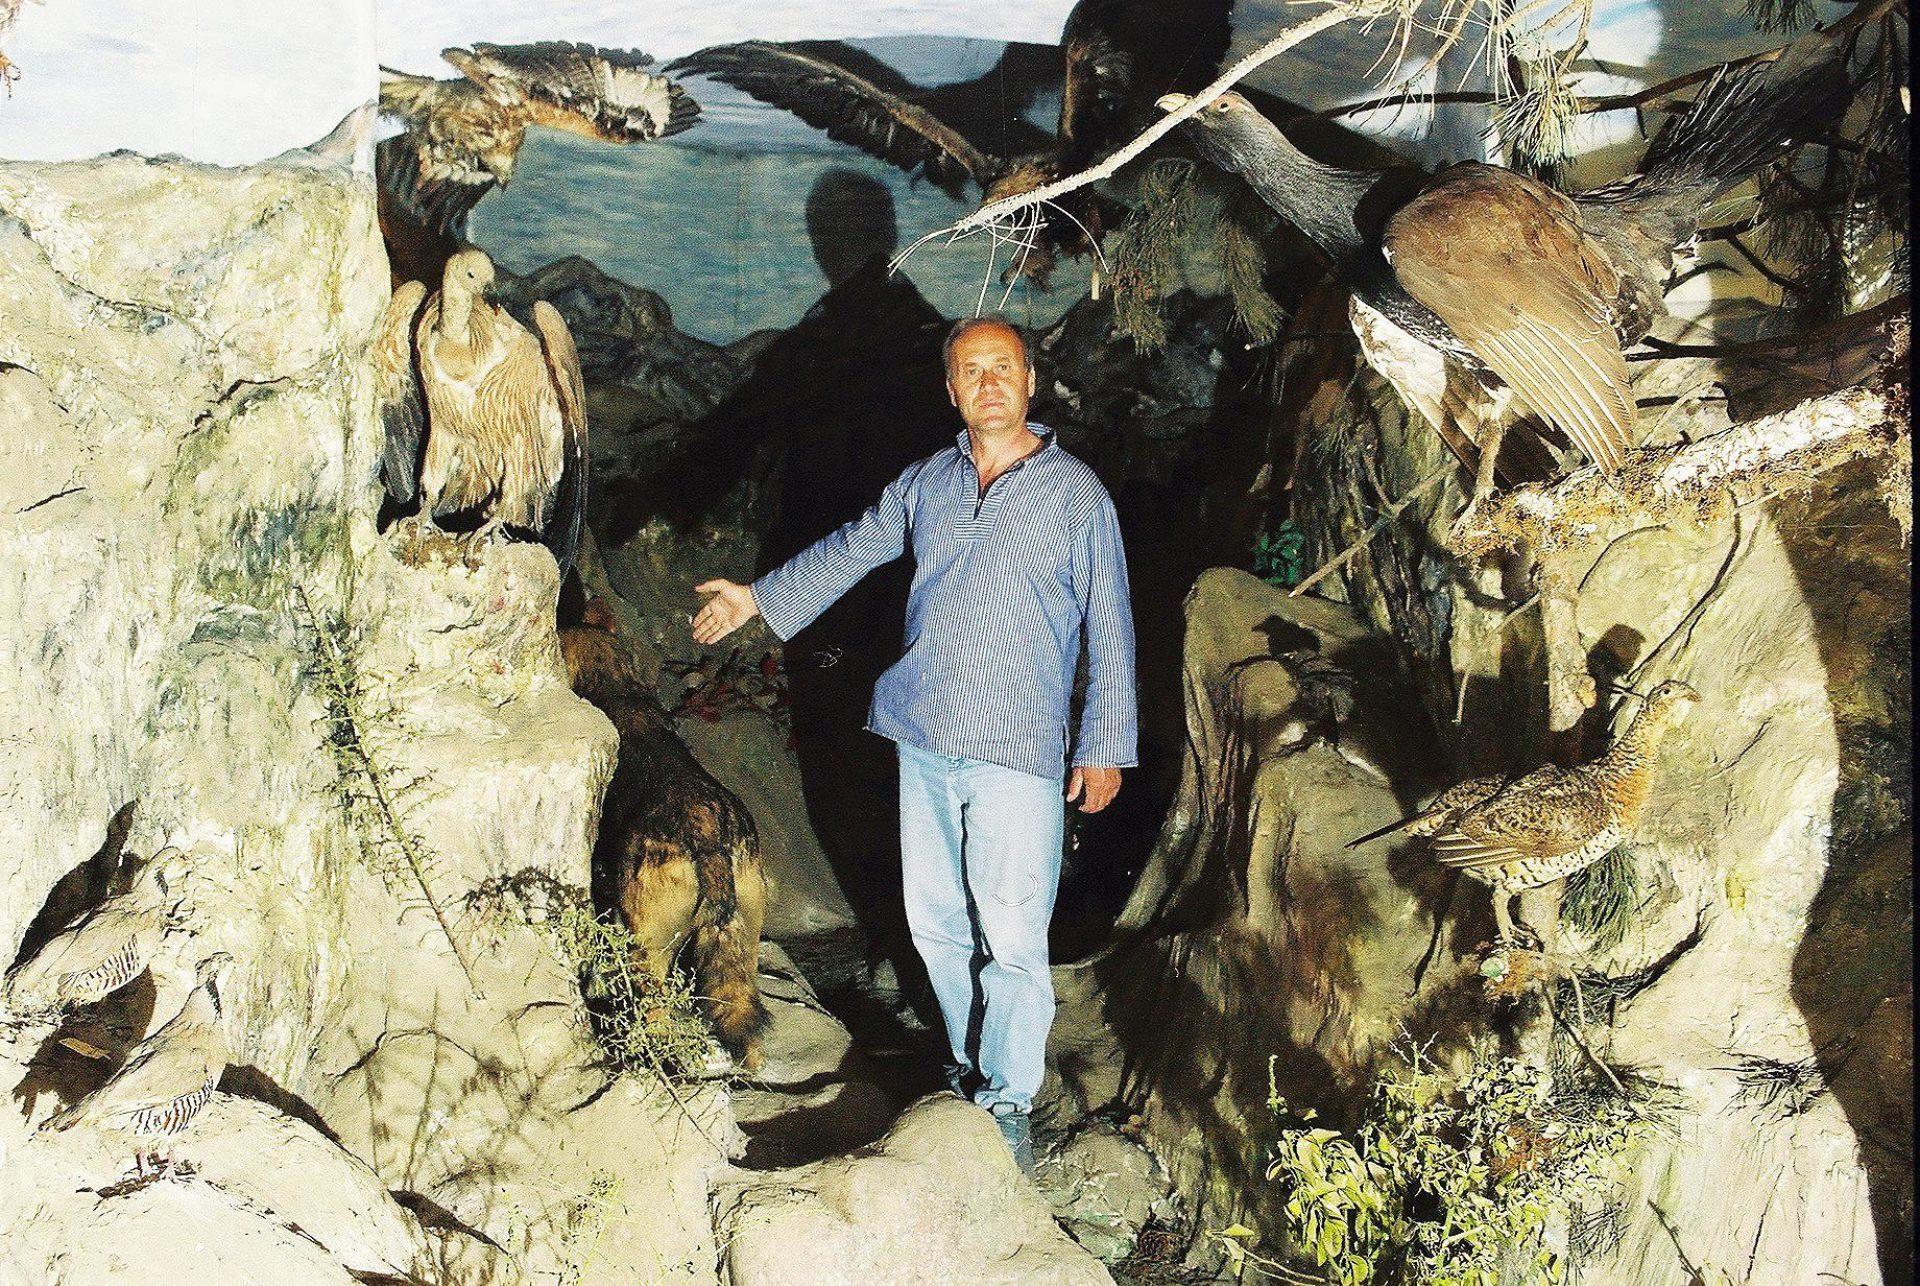 Petrit Halilaj, Special Edition (ex-Natural History Museum of Kosovo), 2013 (24/80)